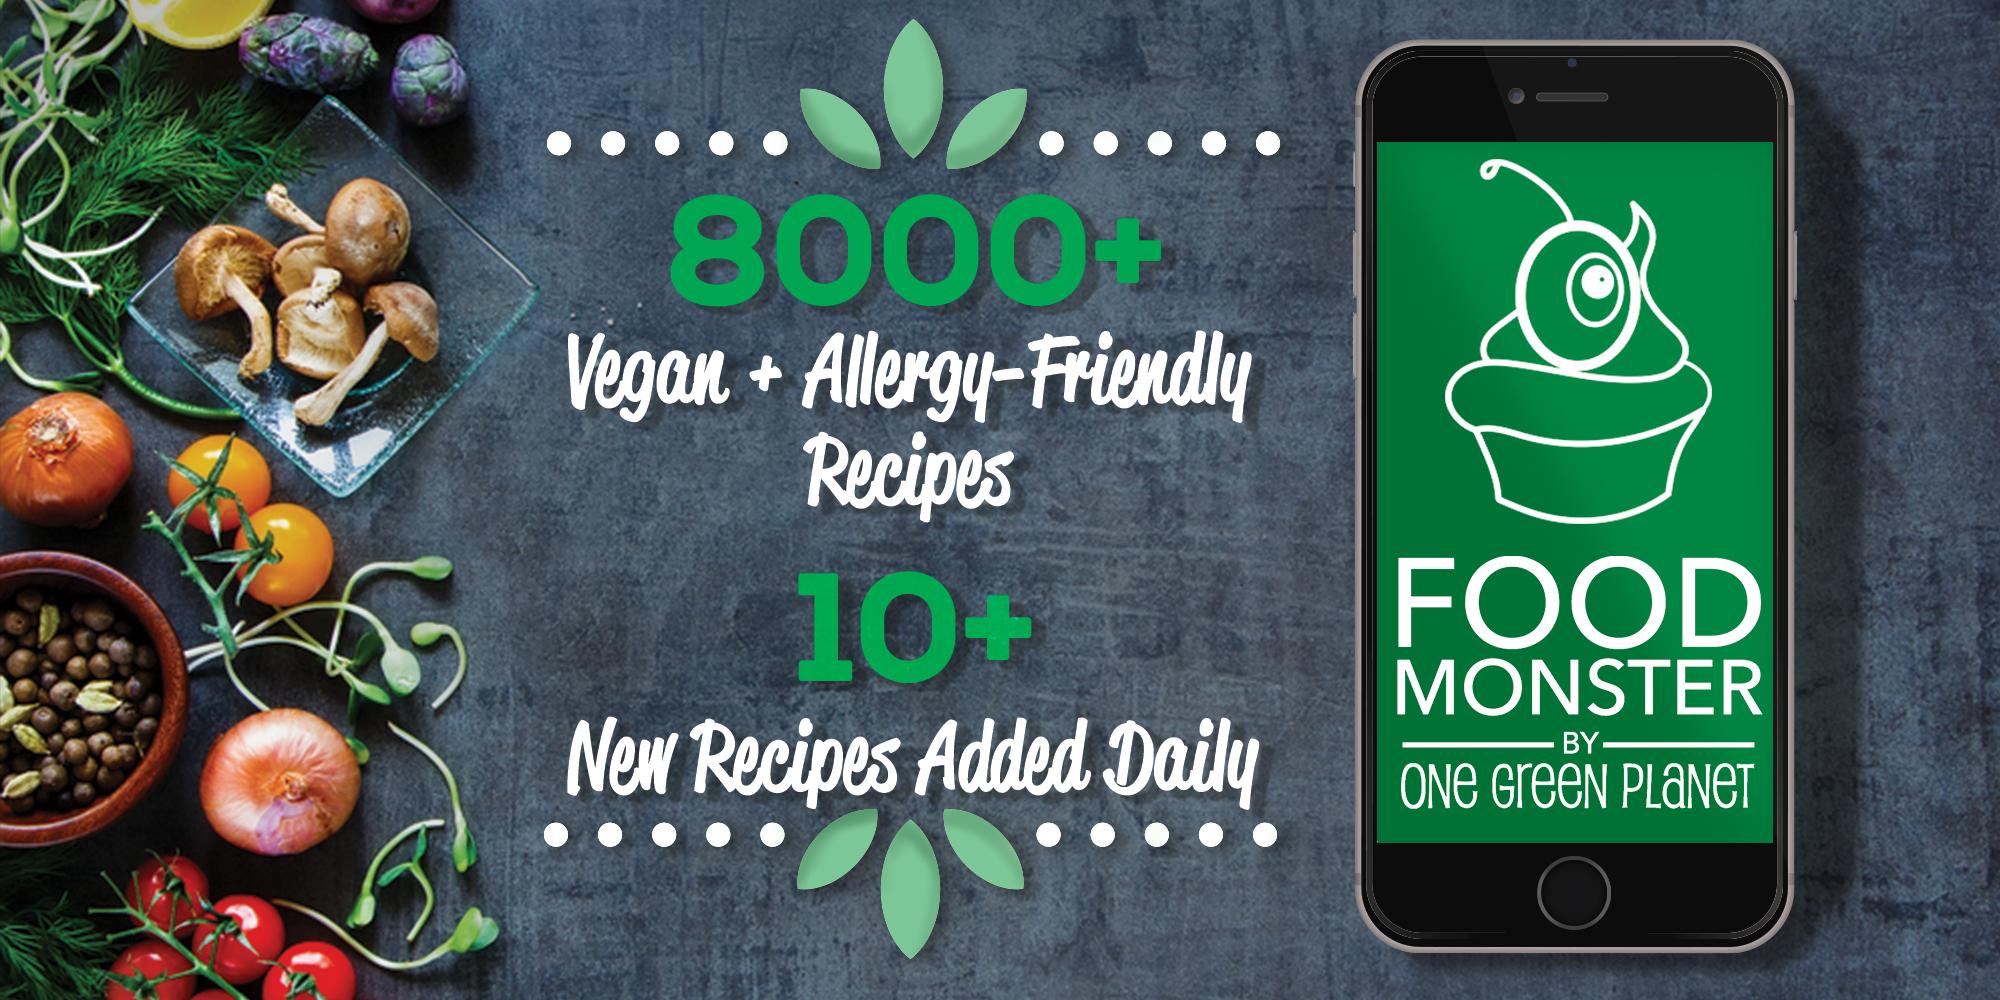 Food monster download the largest vegan food app one green planet the biggest baddest yummiest vegan food app forumfinder Choice Image